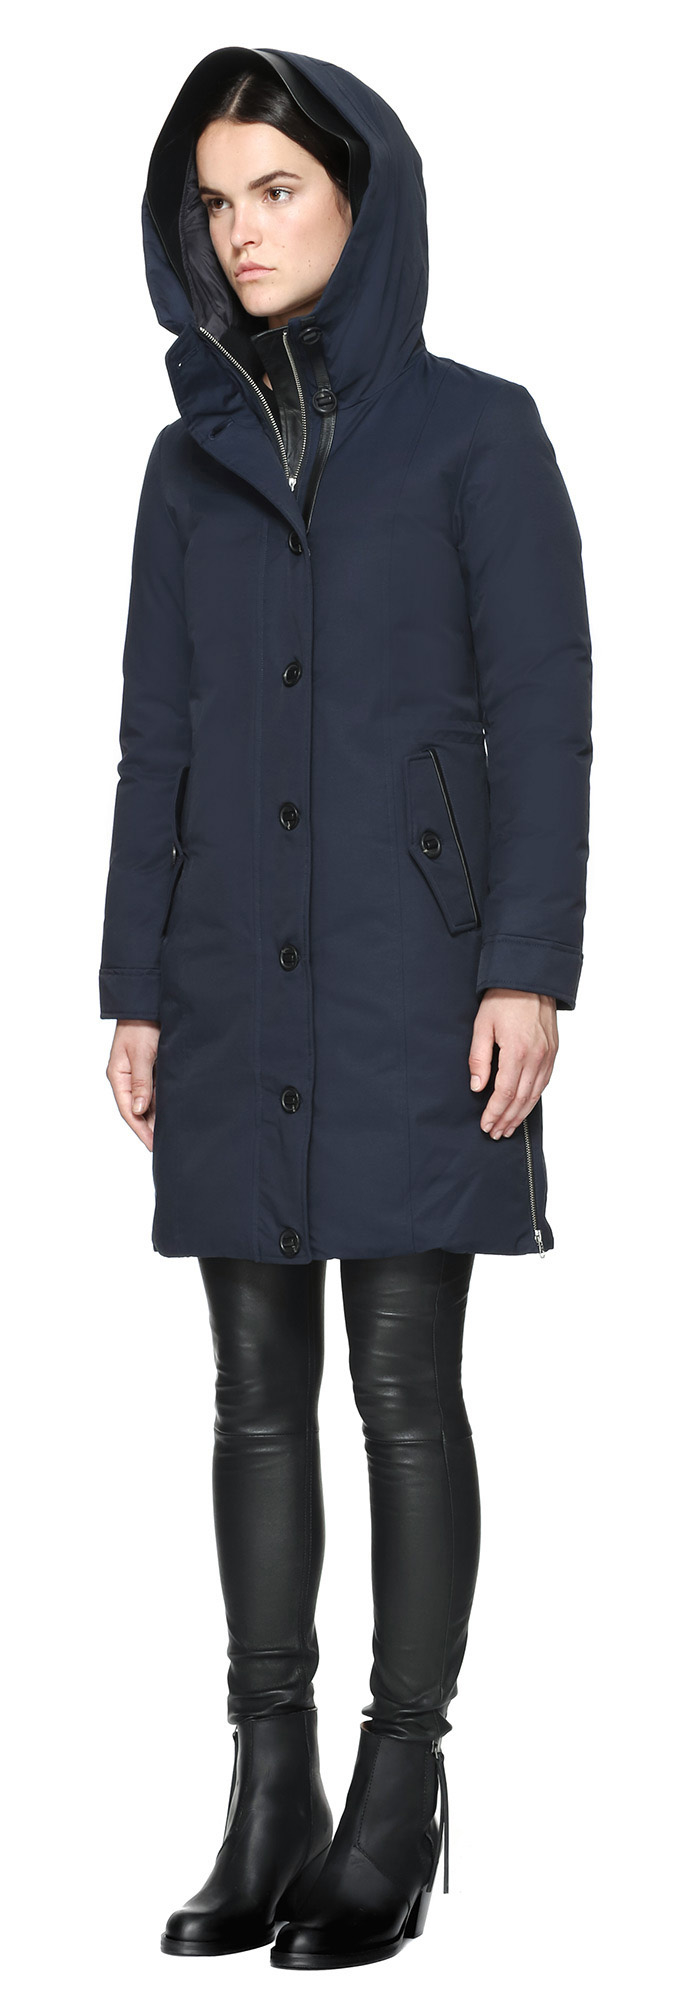 Mackage Nimah Knee Length Parka Style Winter Down Coat In